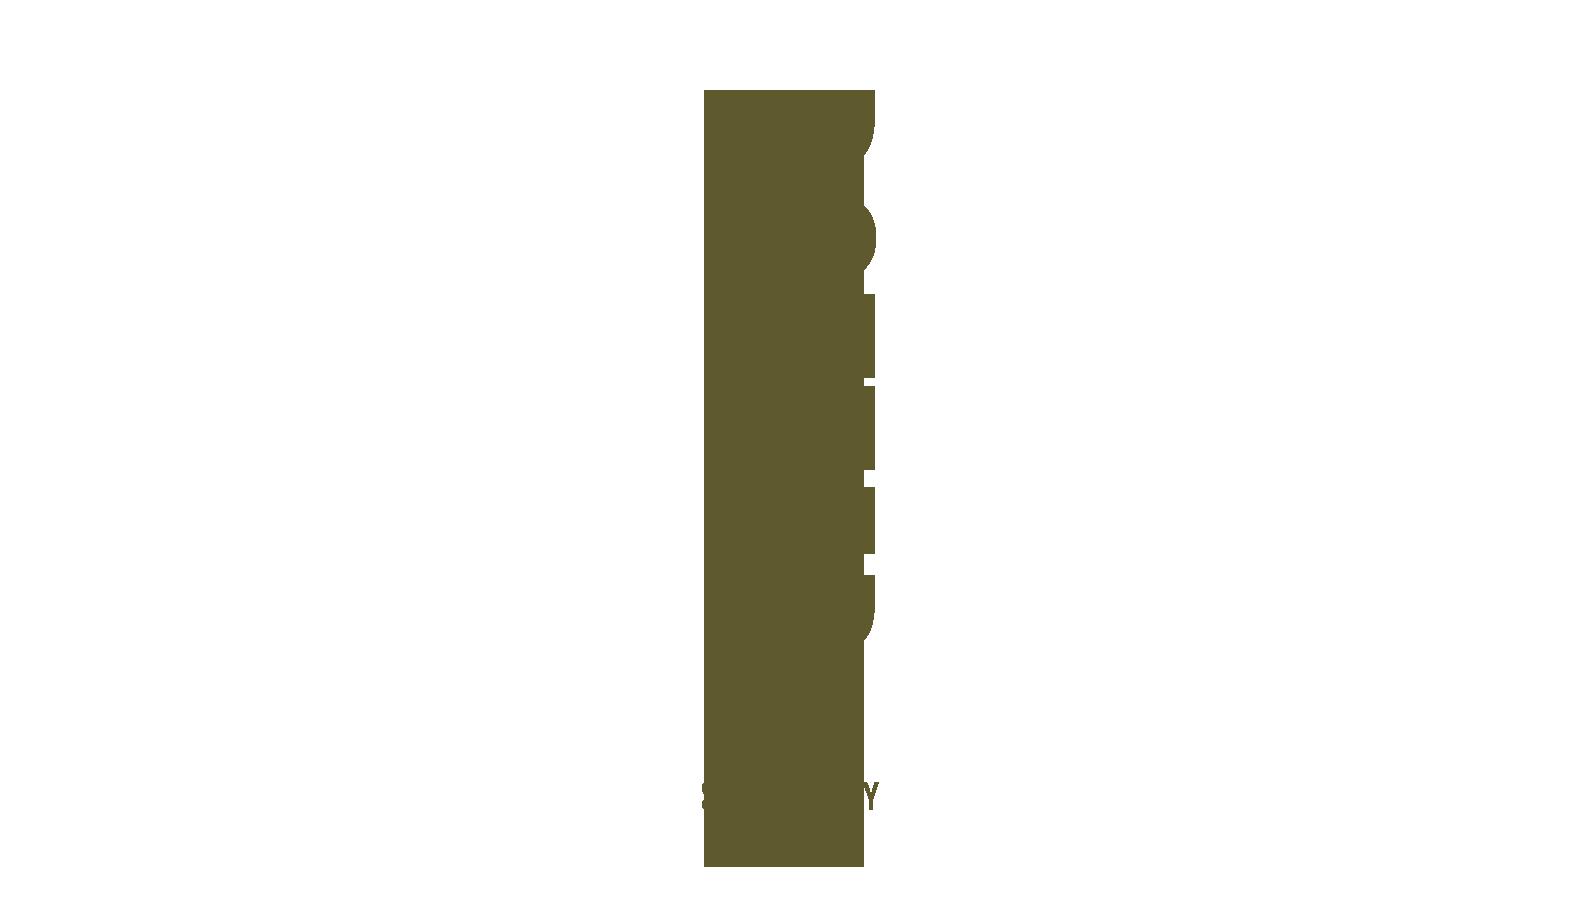 dotter-brändi-strategia-design-gold-PNG22.jpg